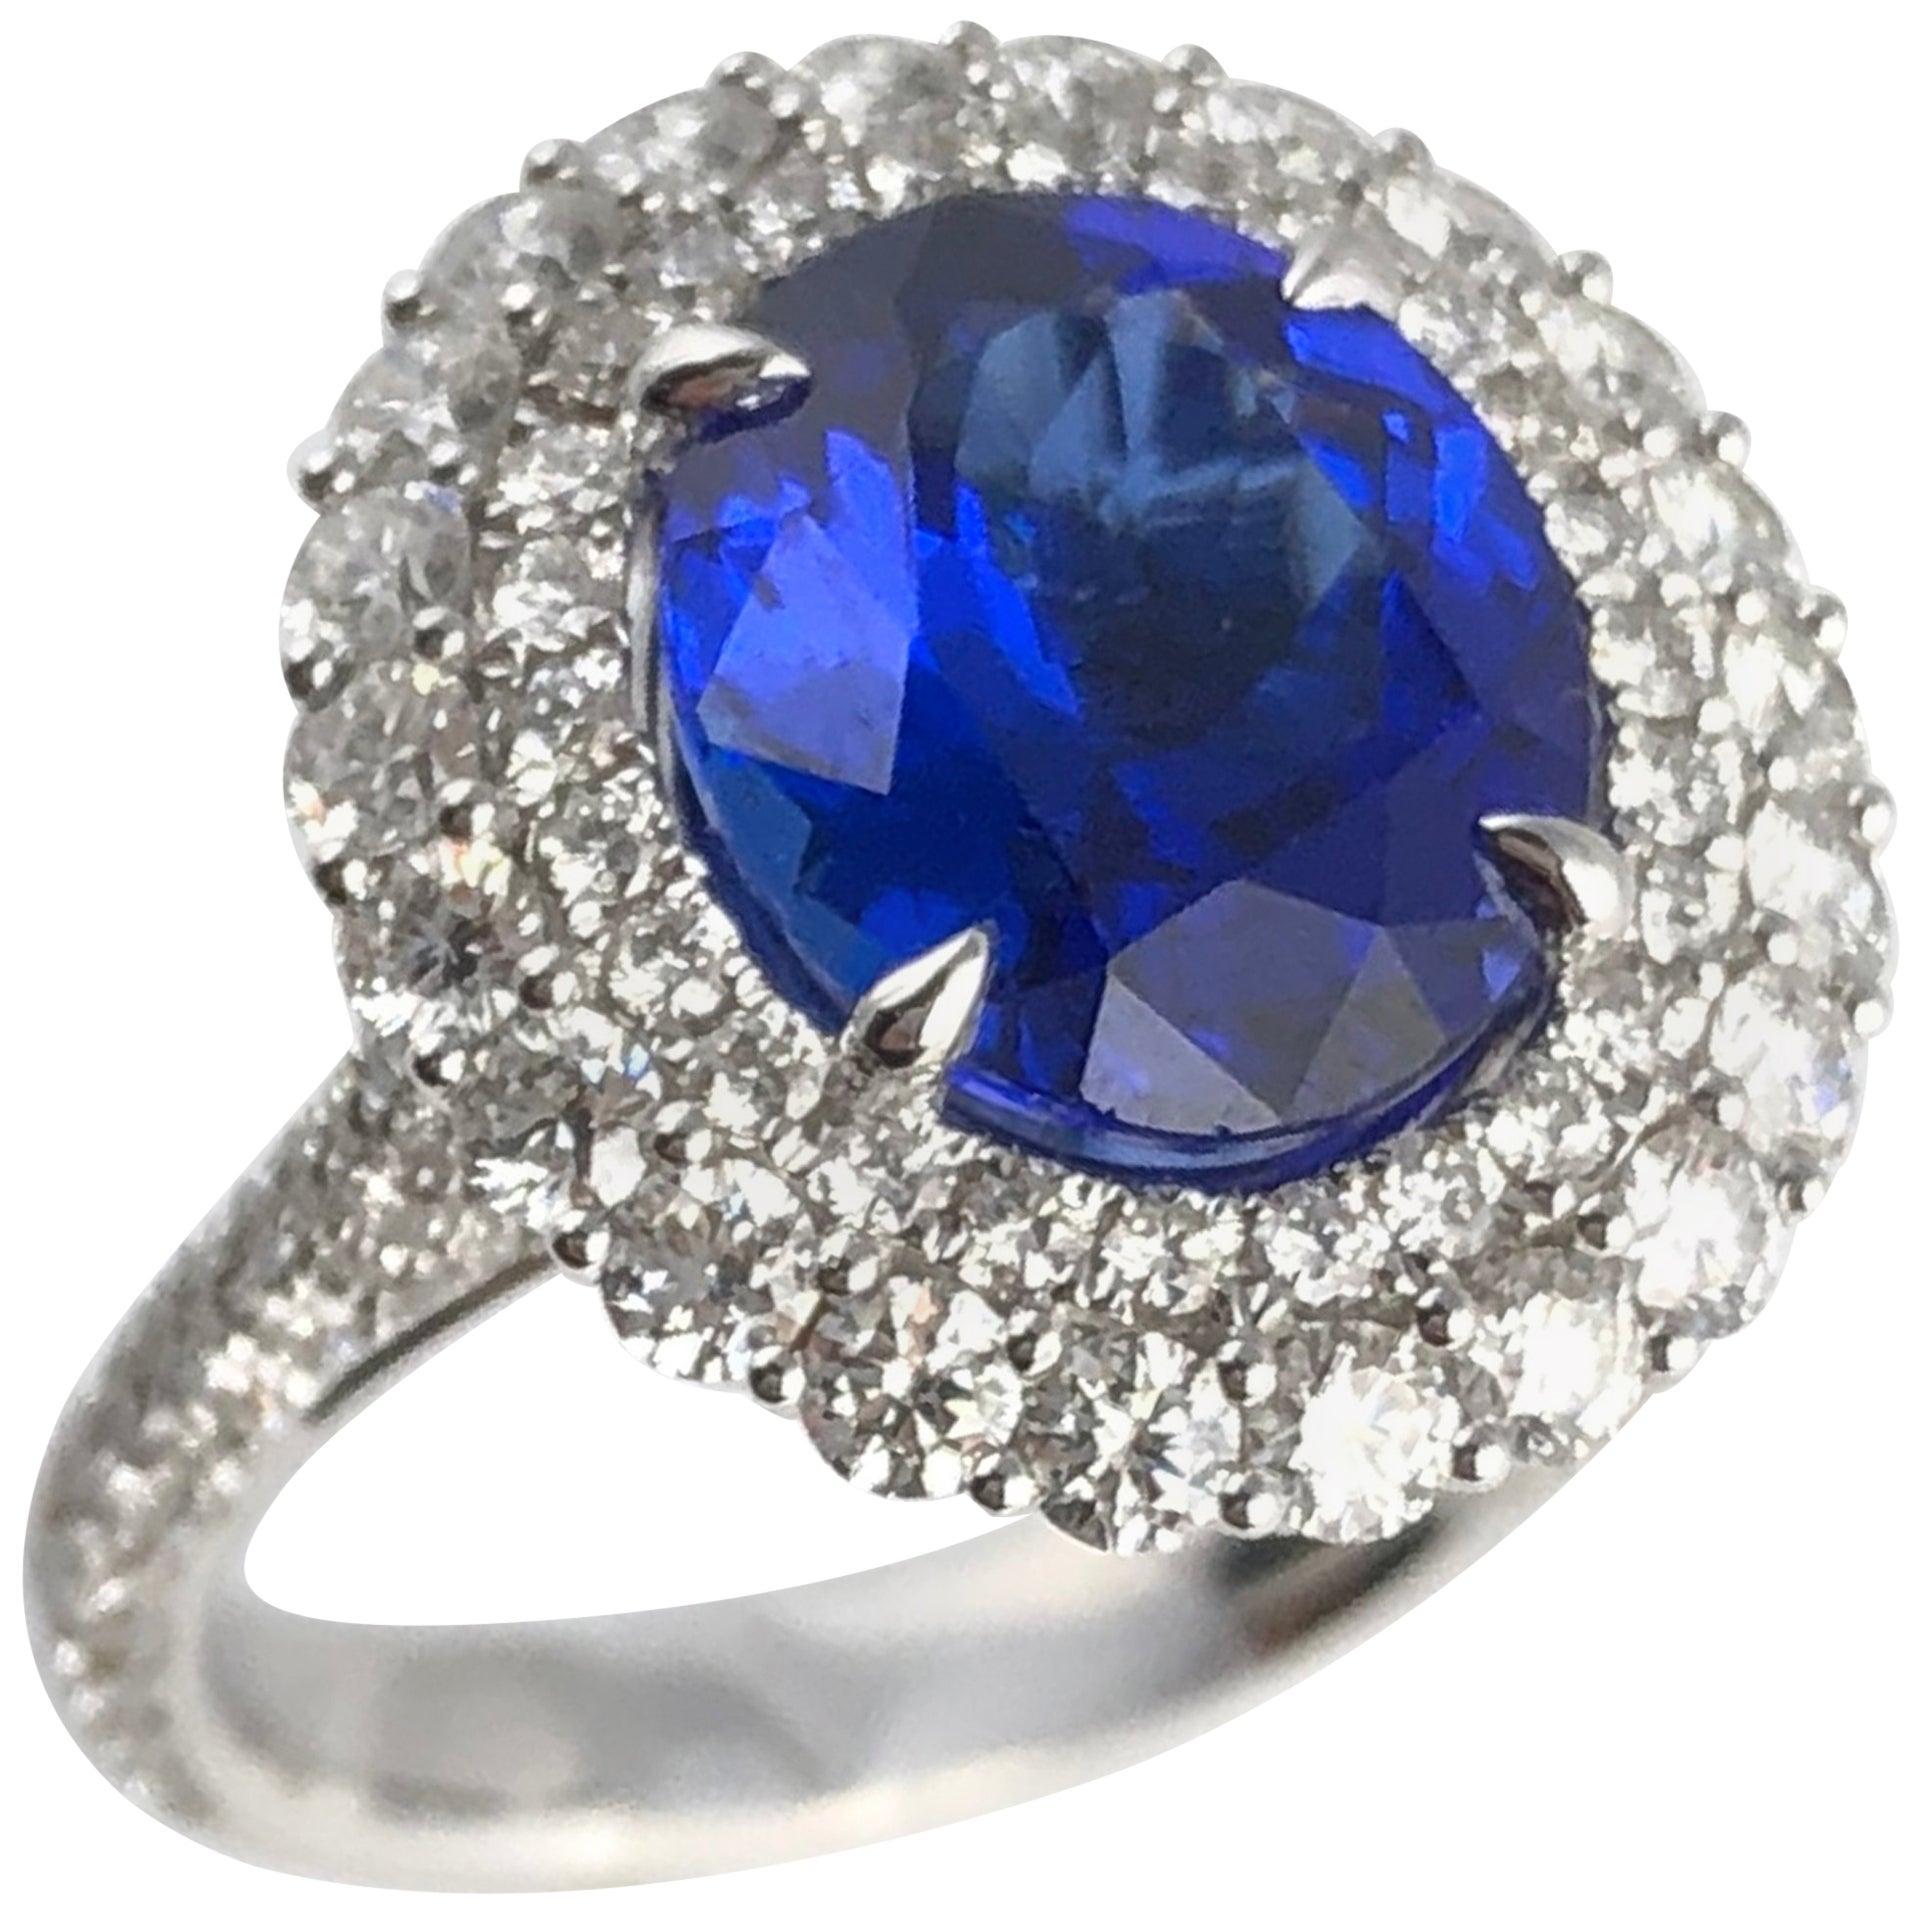 DiamondTown 4.64 Carat Oval Cut Tanzanite and Diamond Halo Ring